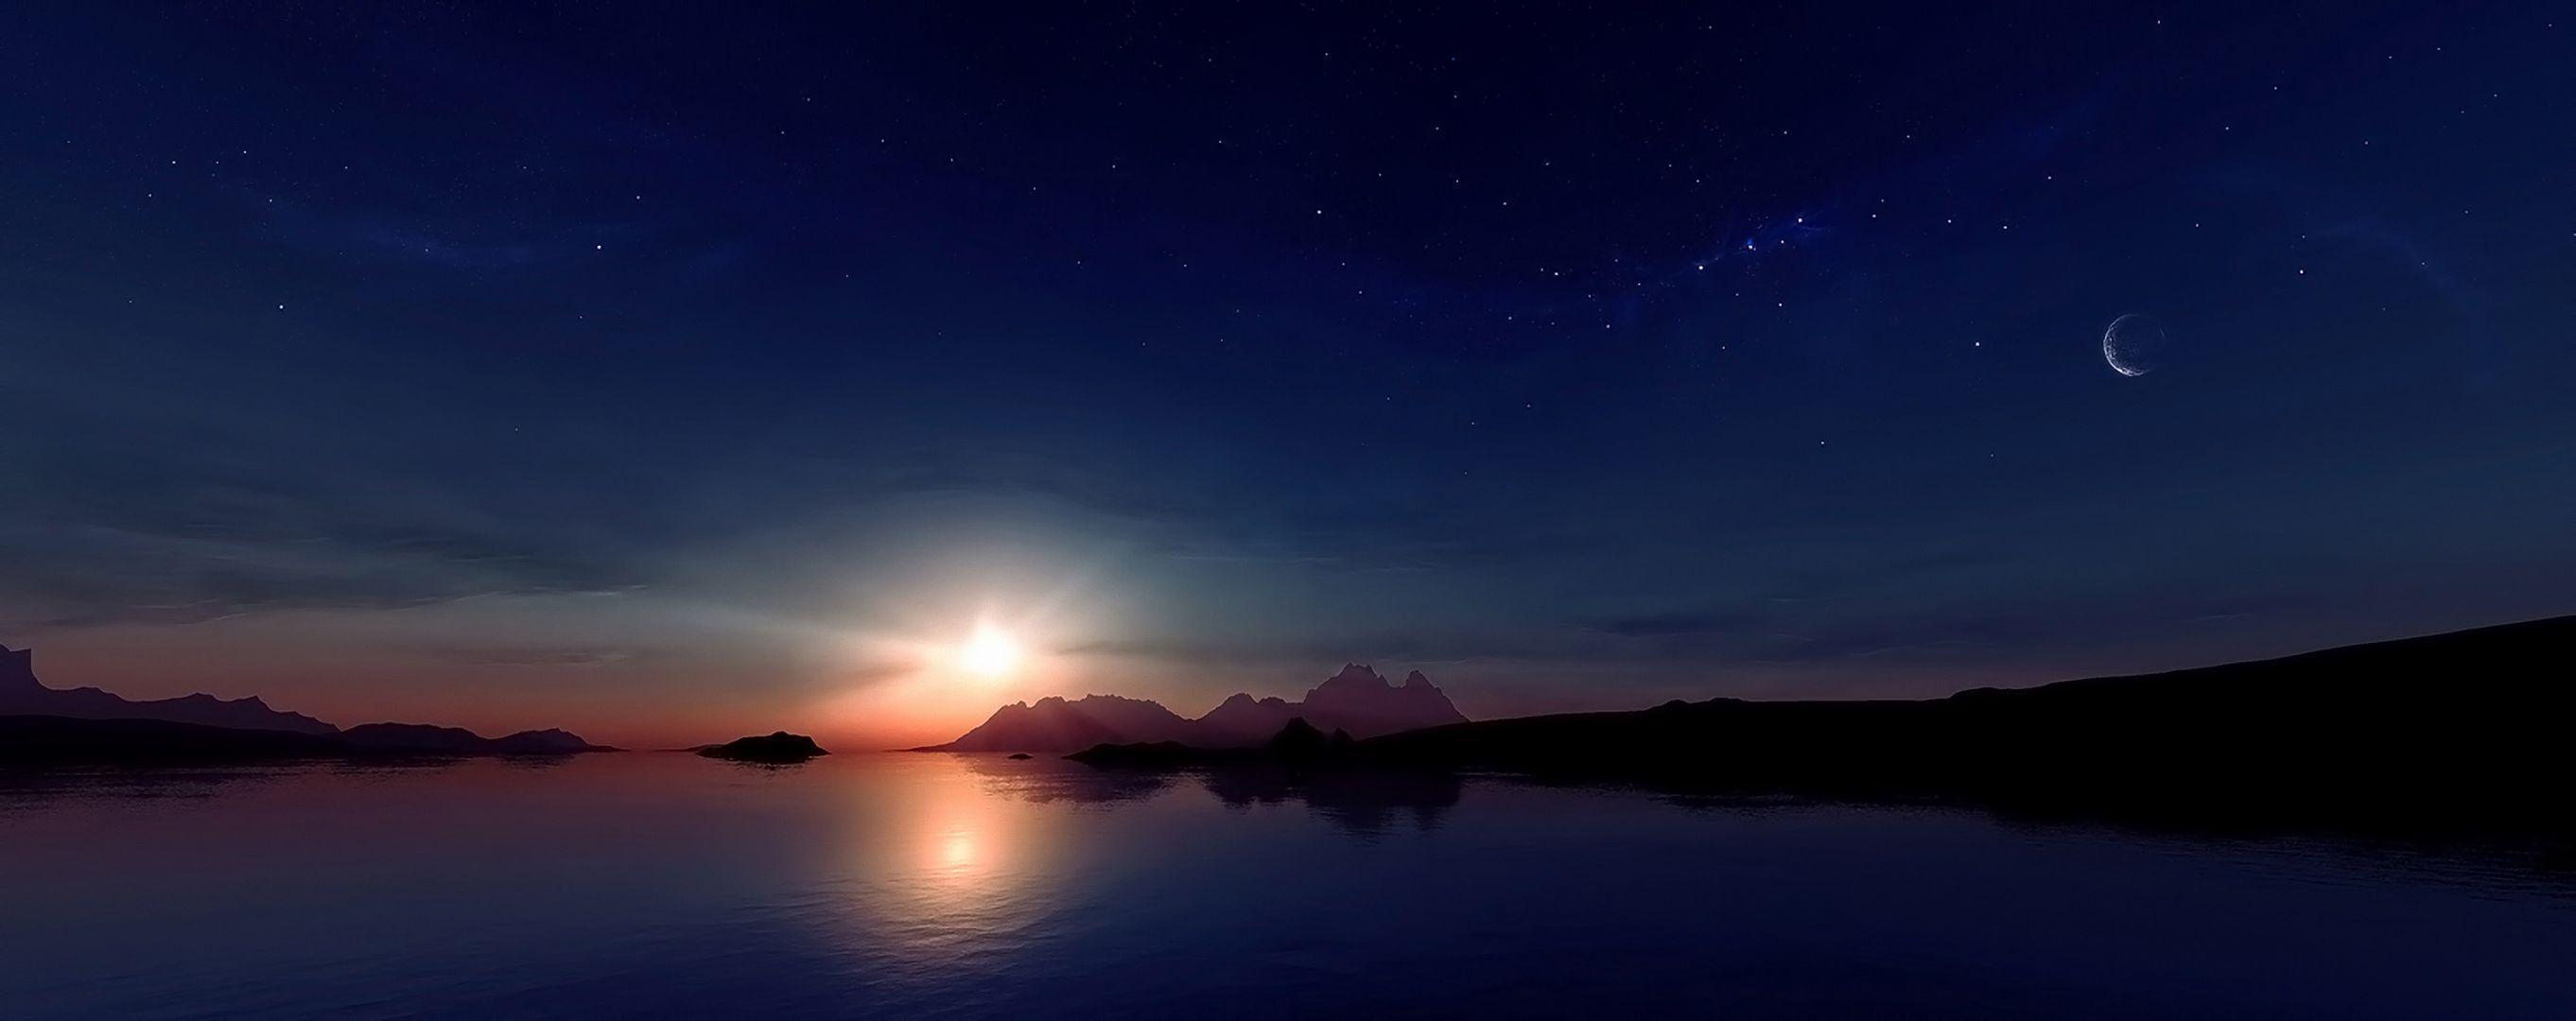 sun moon star background - photo #40